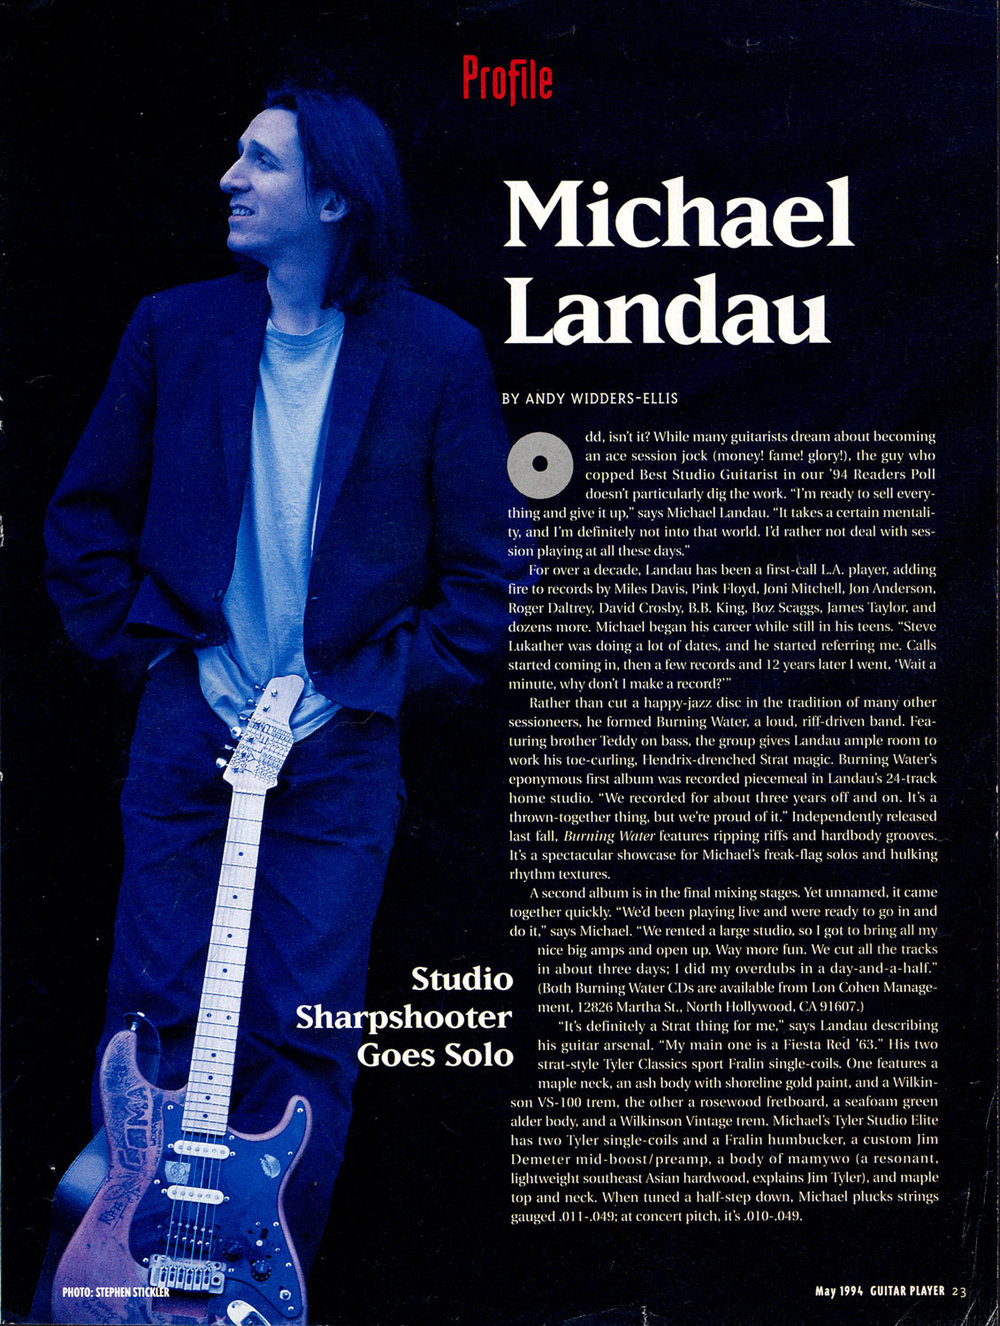 1994 Guitar Player